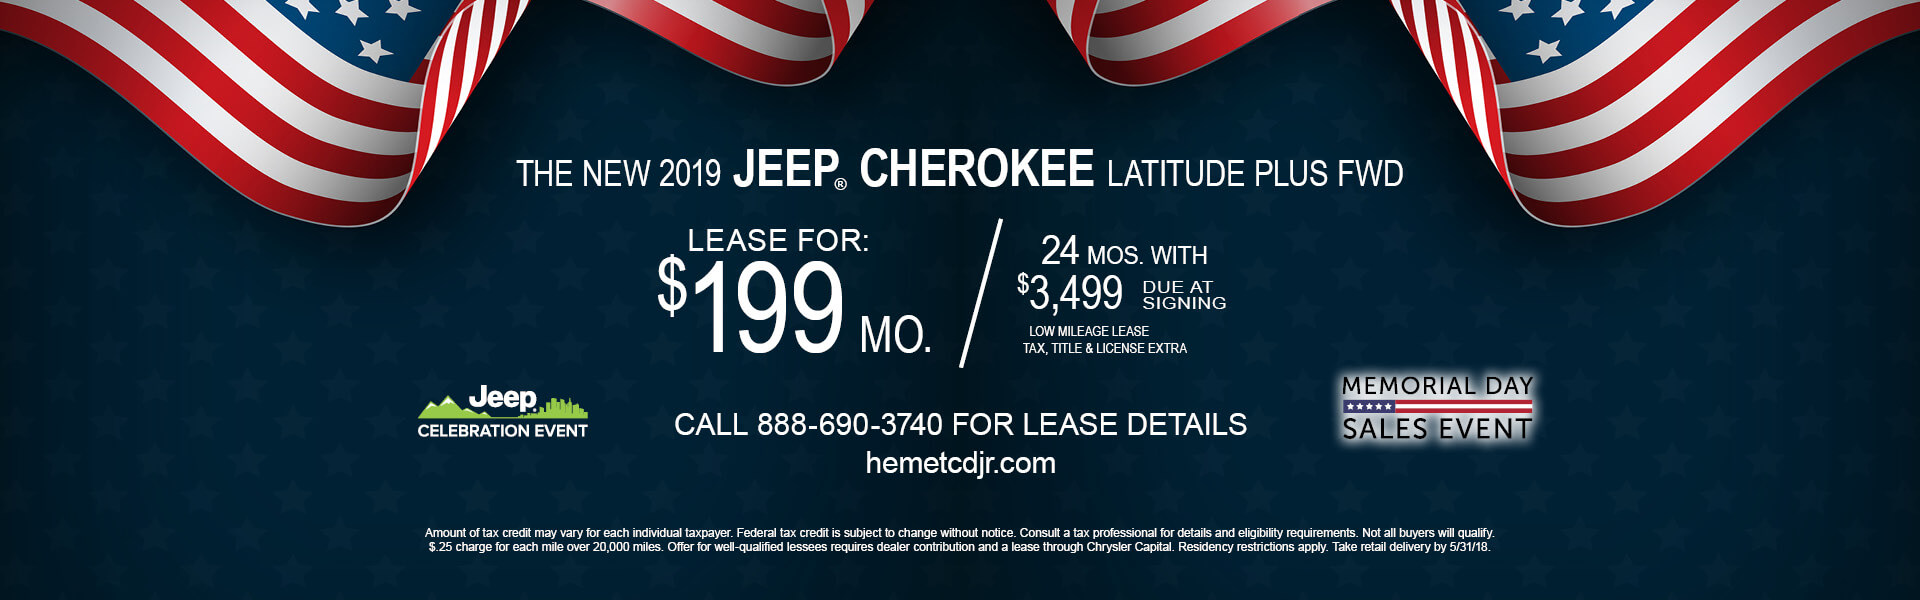 Jeep Cherokee Latitude $199 Lease